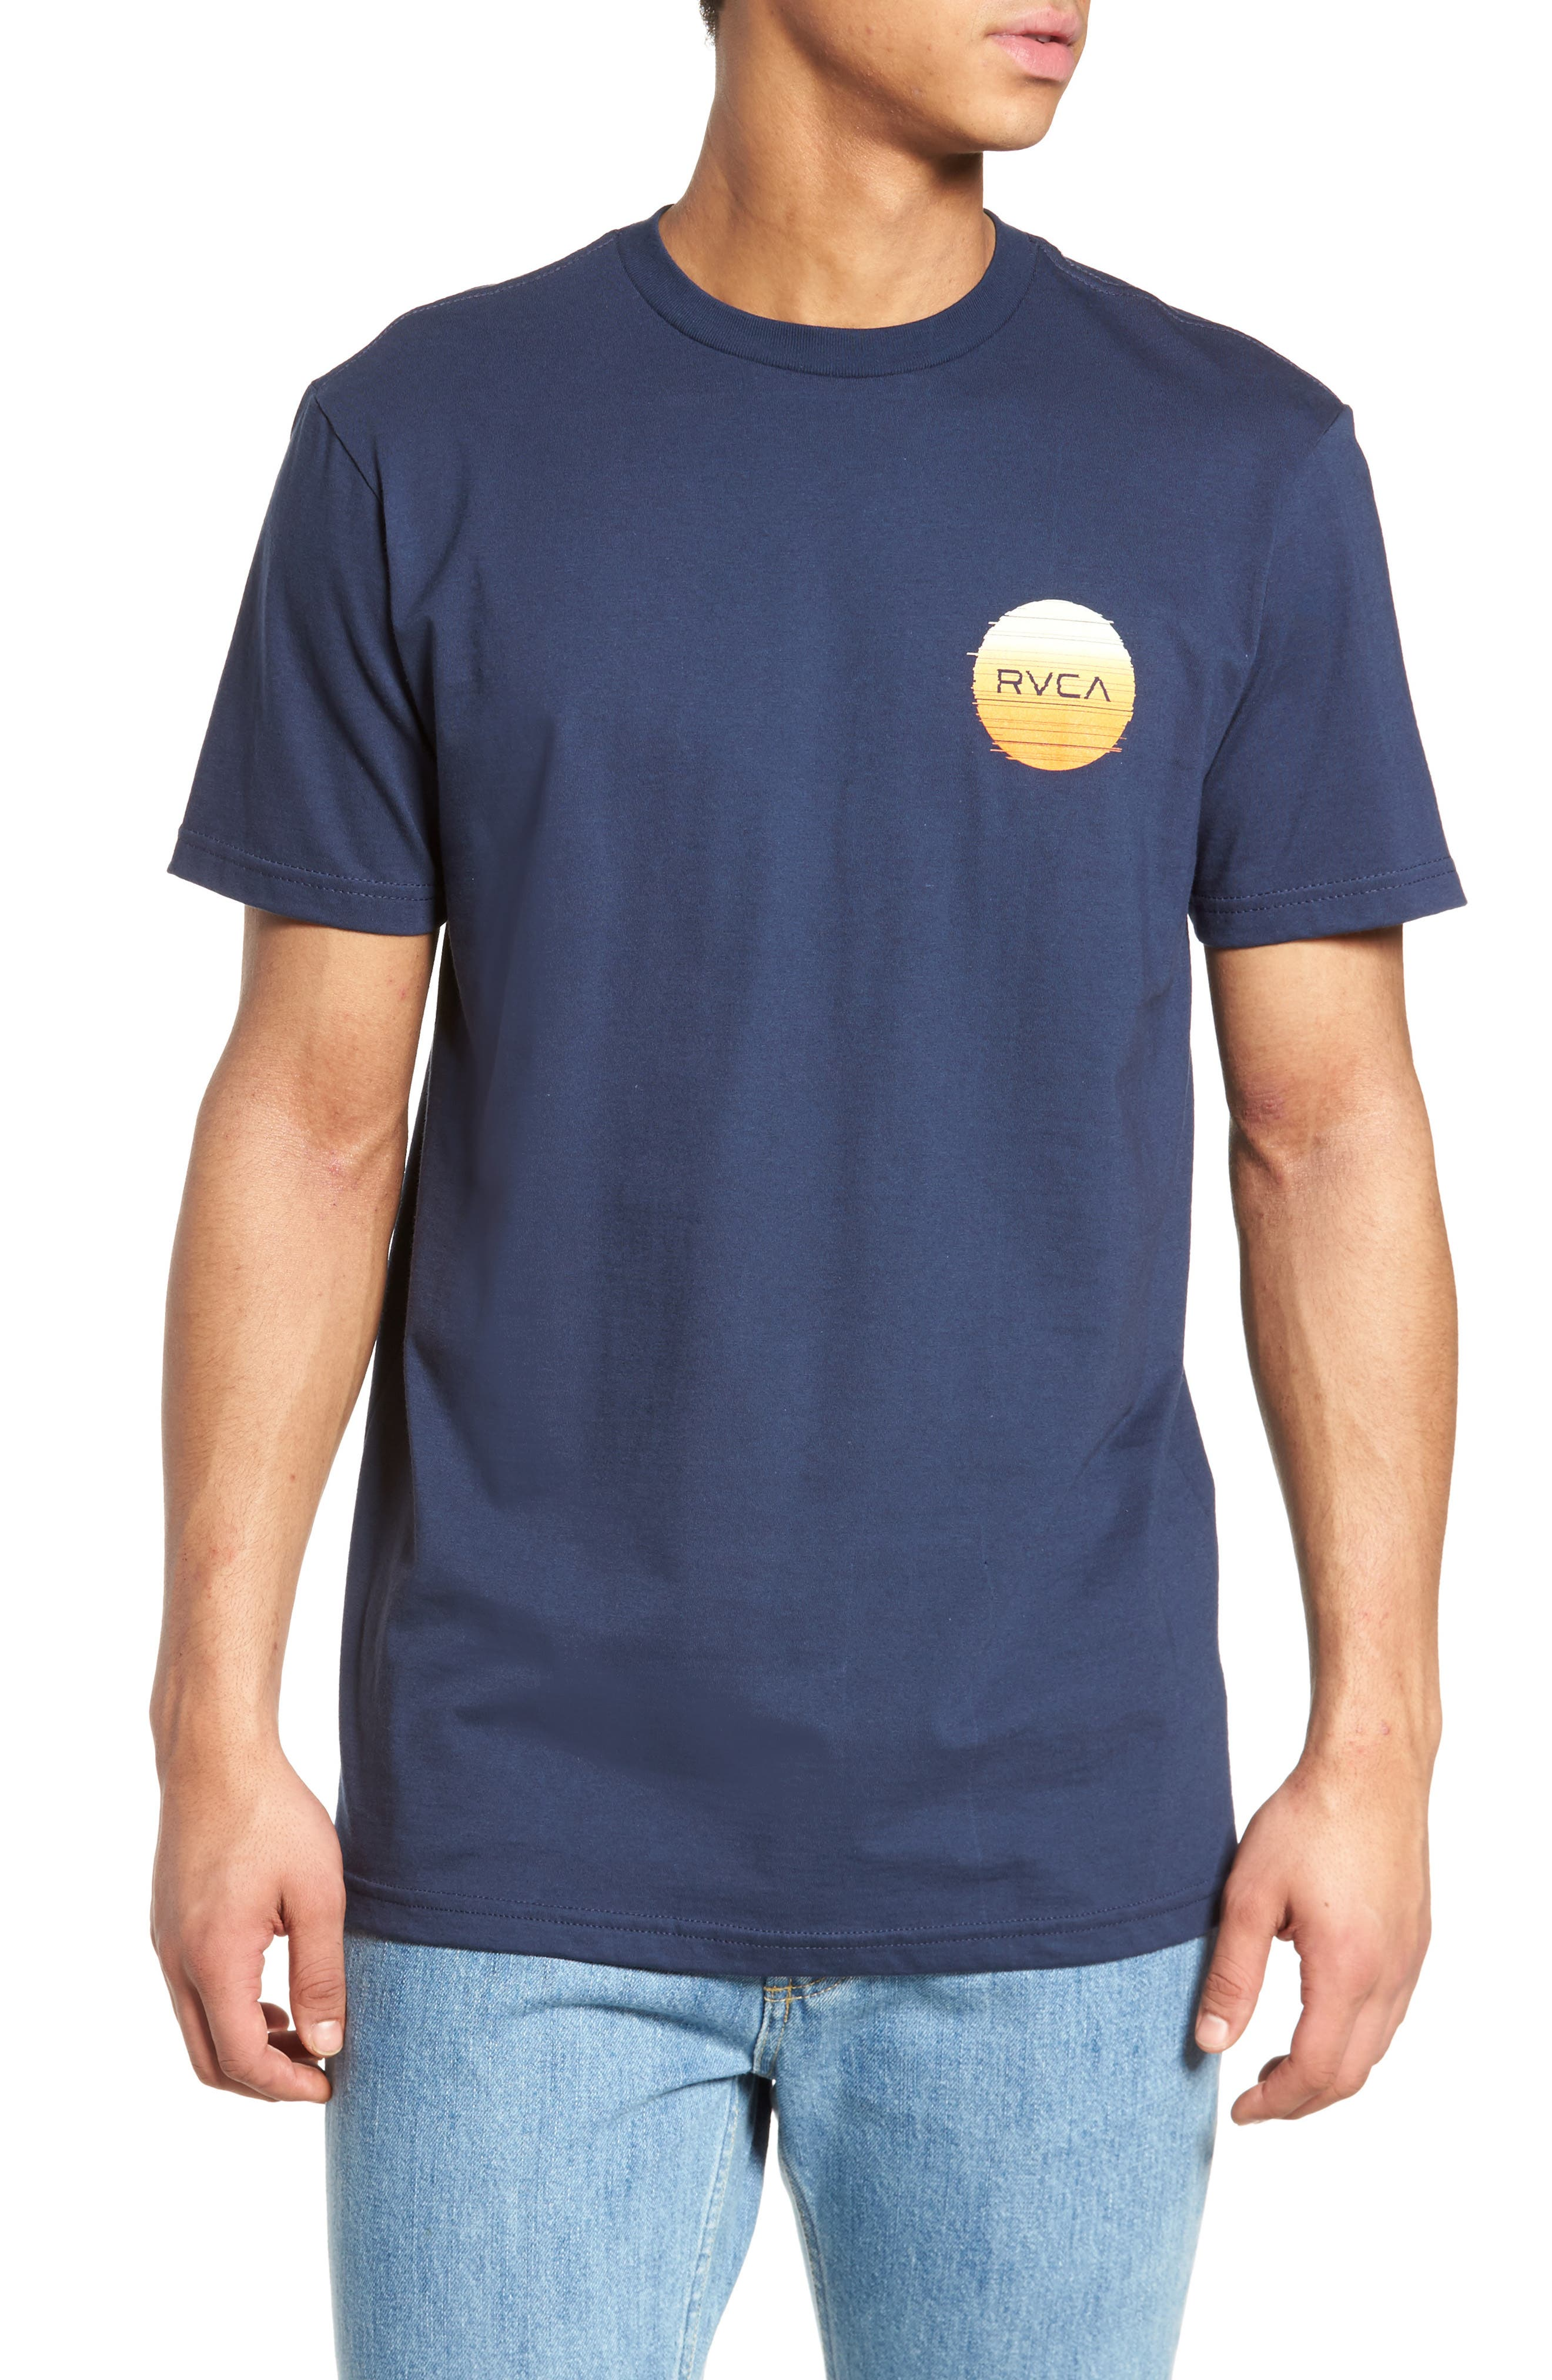 Glitch Motors T-Shirt,                             Main thumbnail 1, color,                             Federal Blue